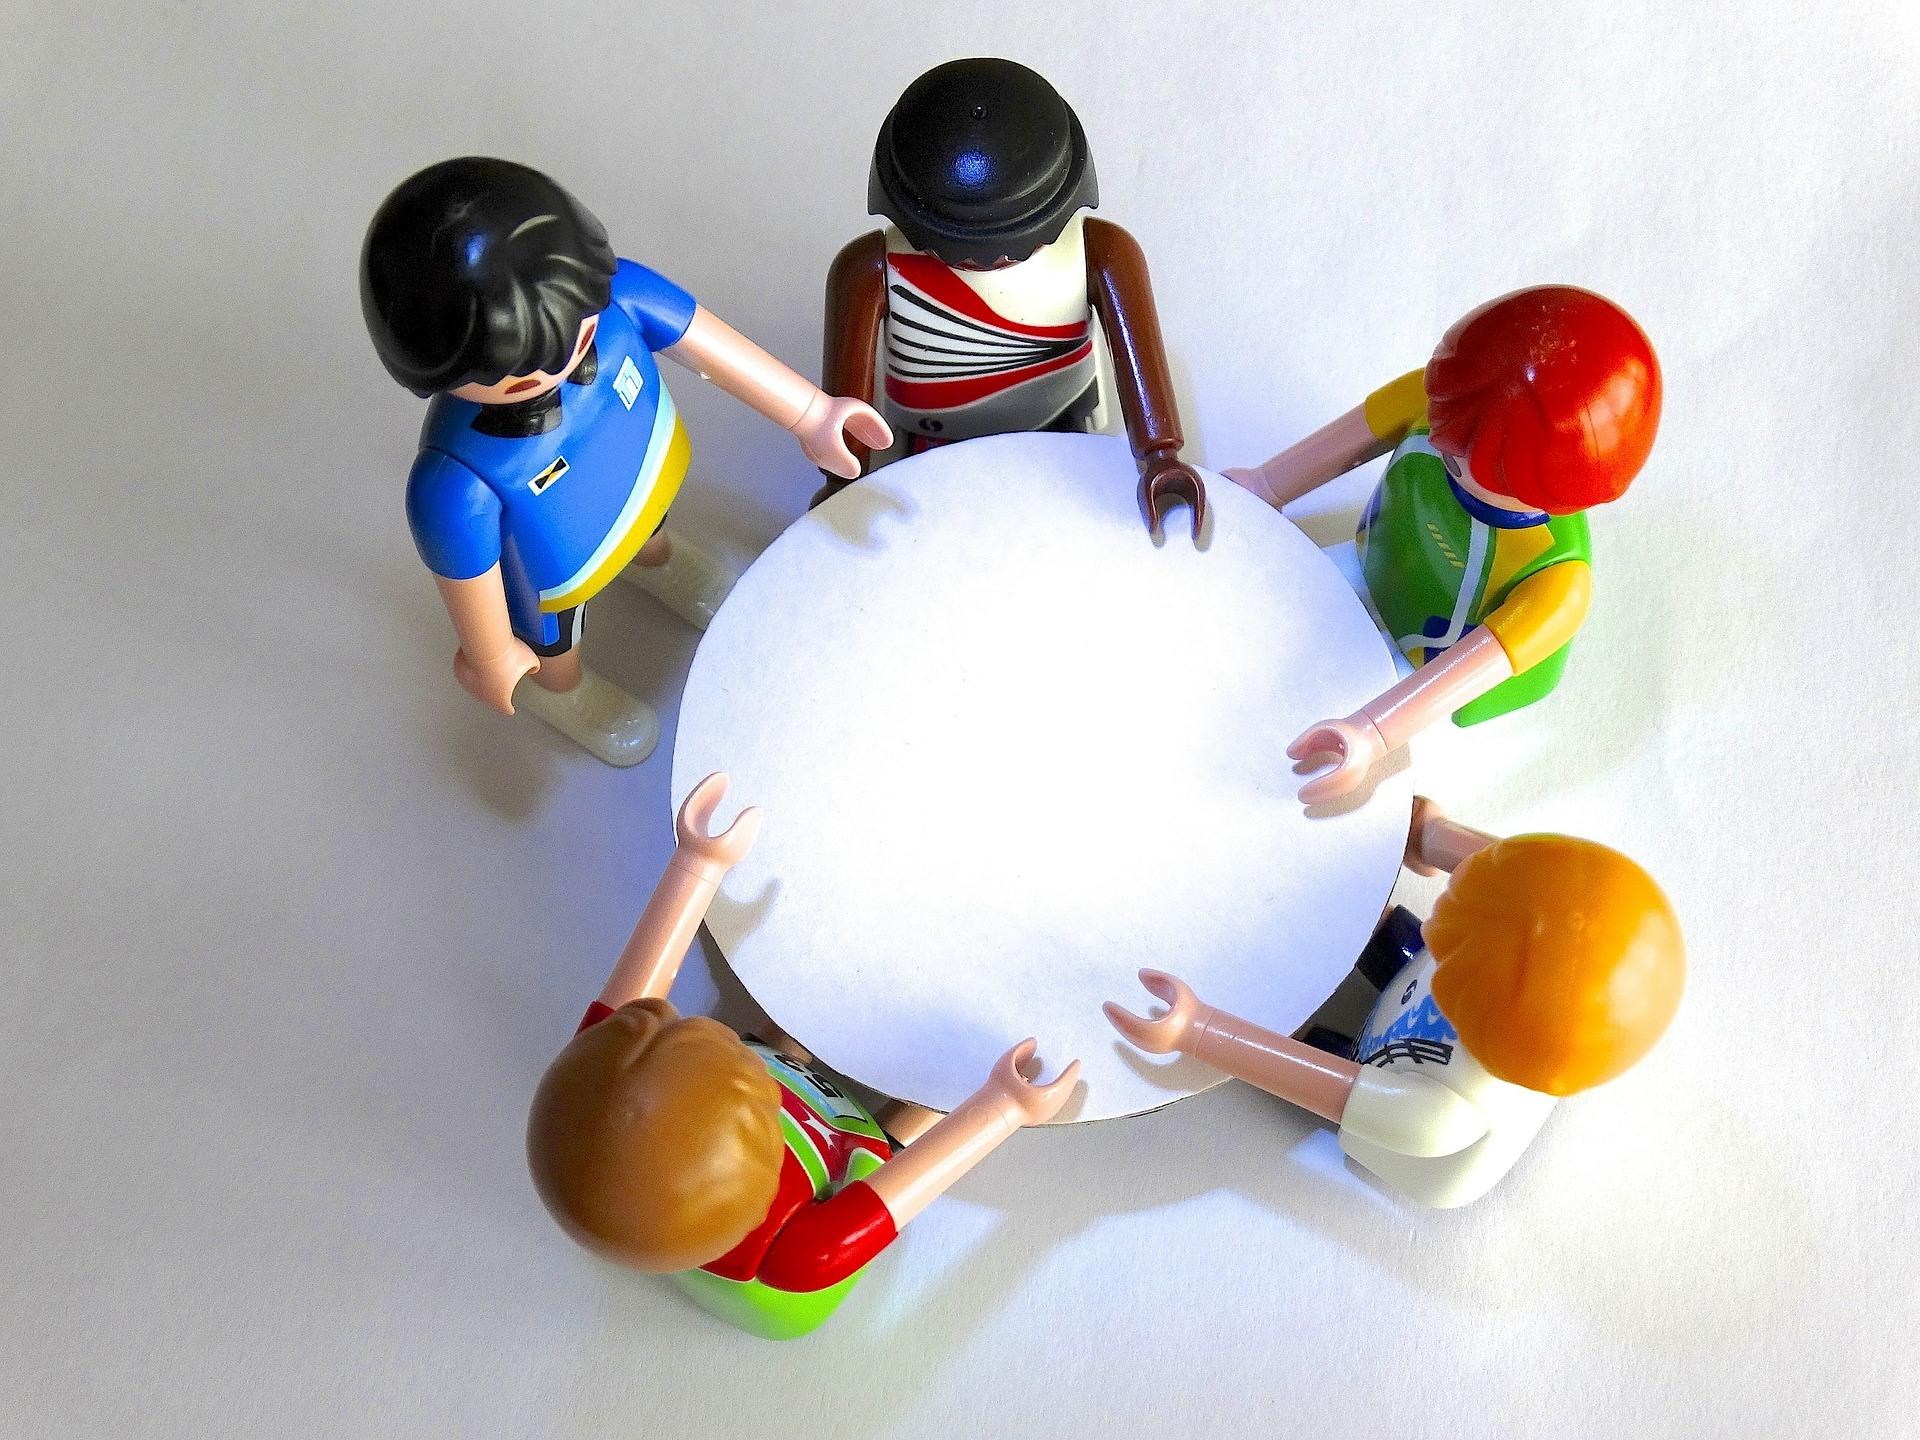 Toys having conversation